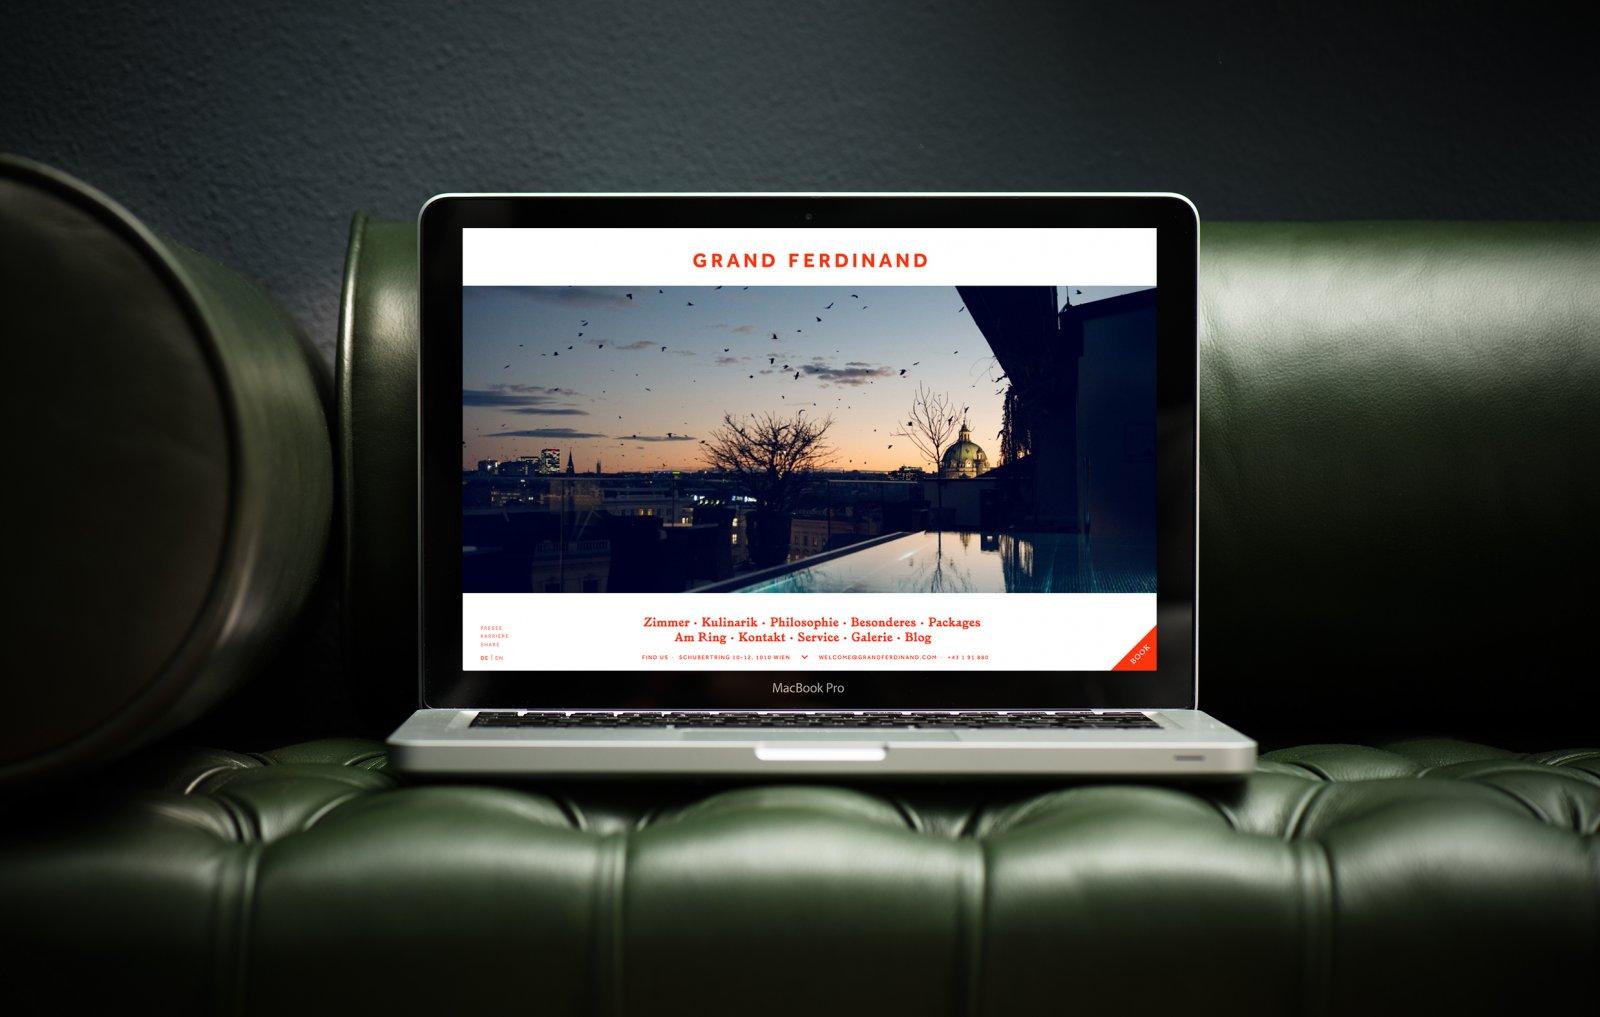 Brand identity and website for Vienna's Grand Ferdinand hotel by Austrian graphic design studio Moodley